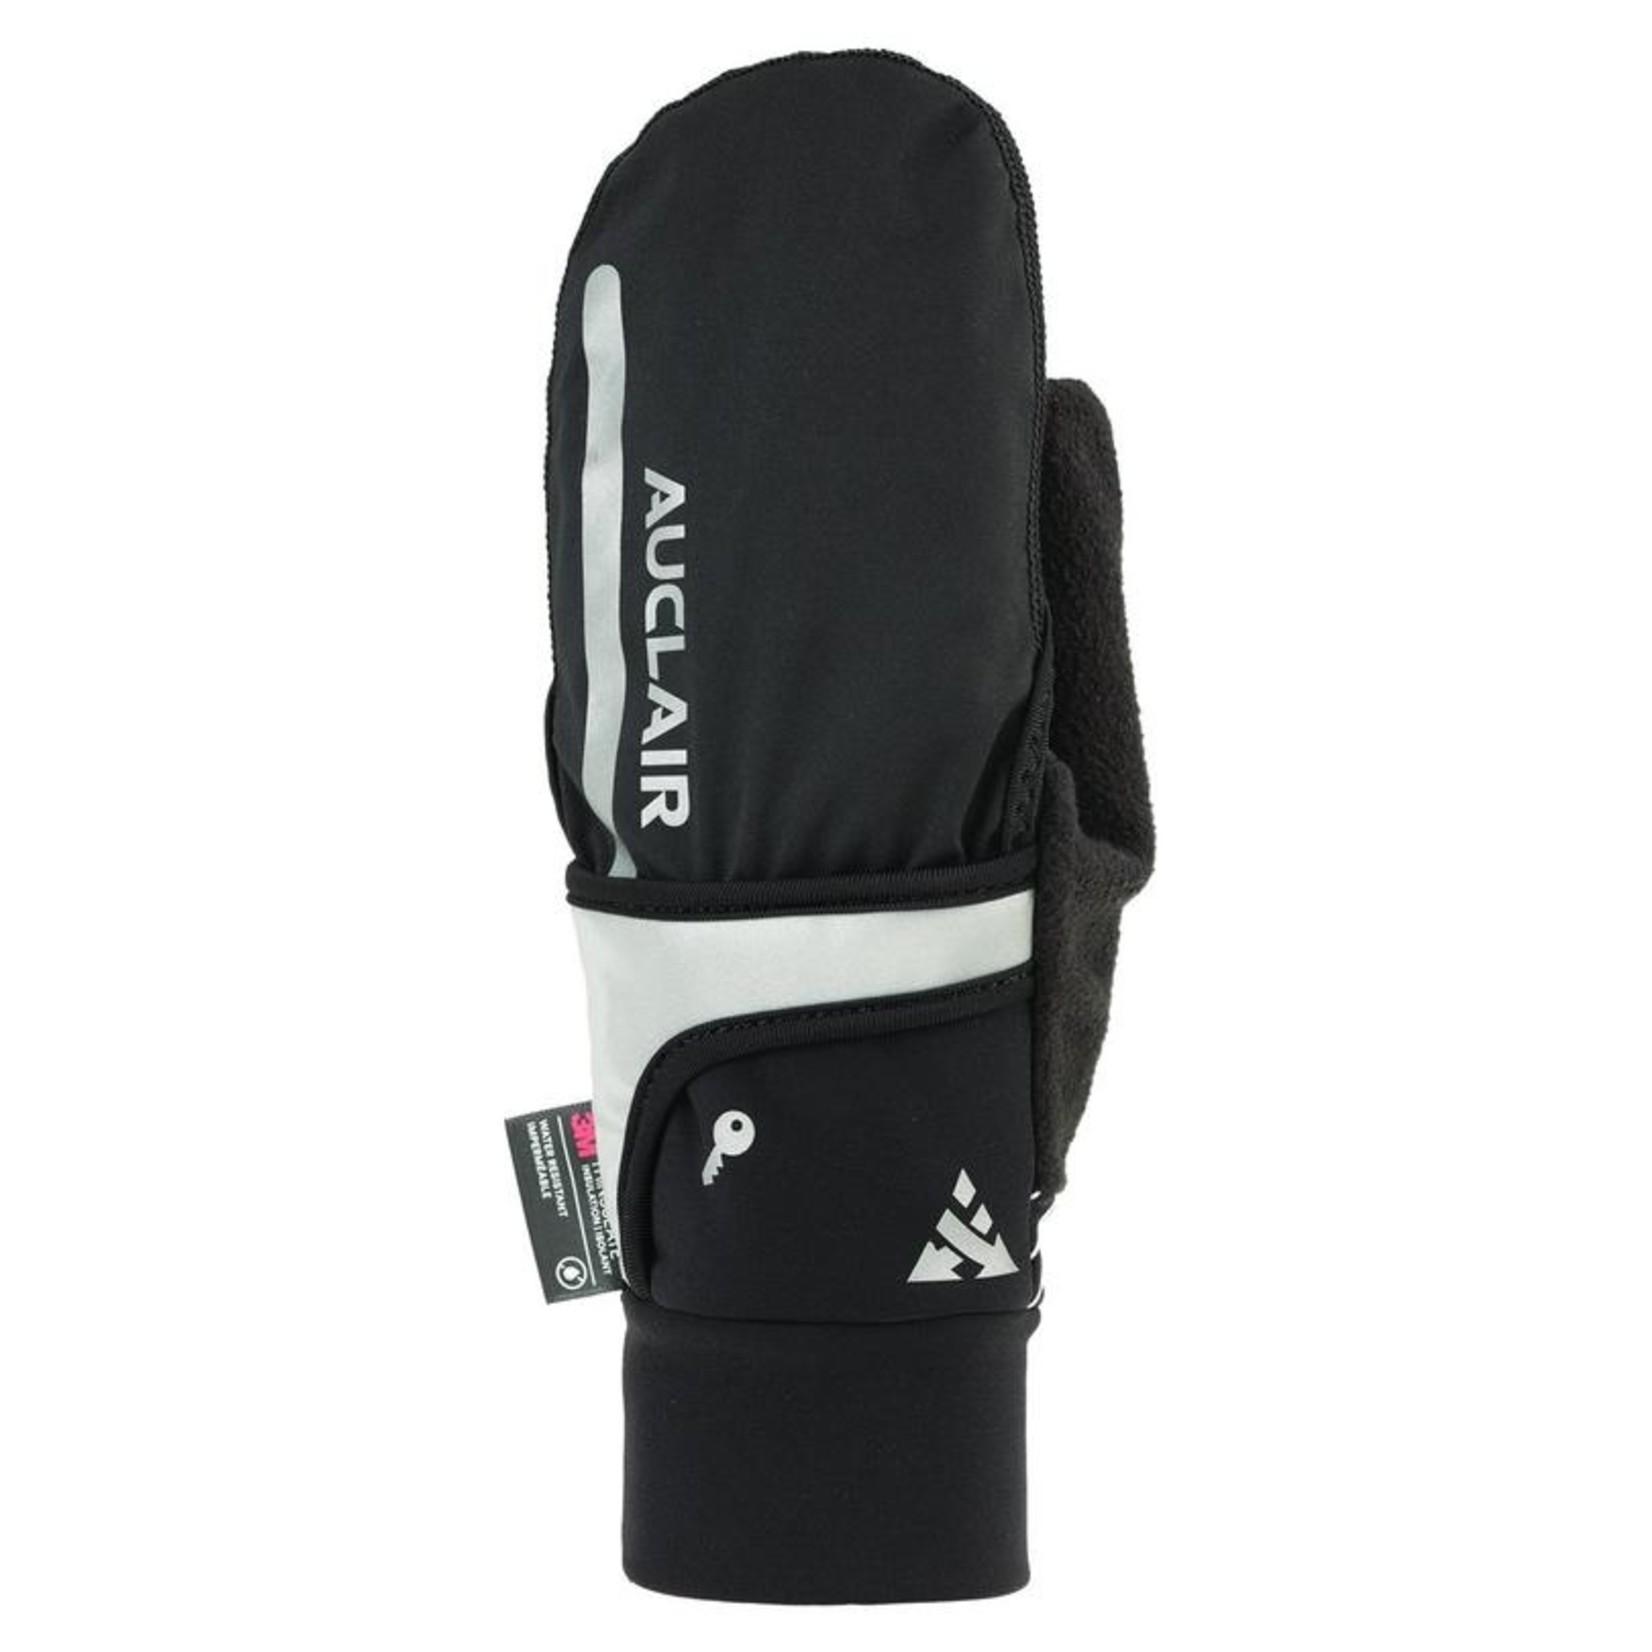 Auclair Auclair Impulse II Glove with Wind Cover